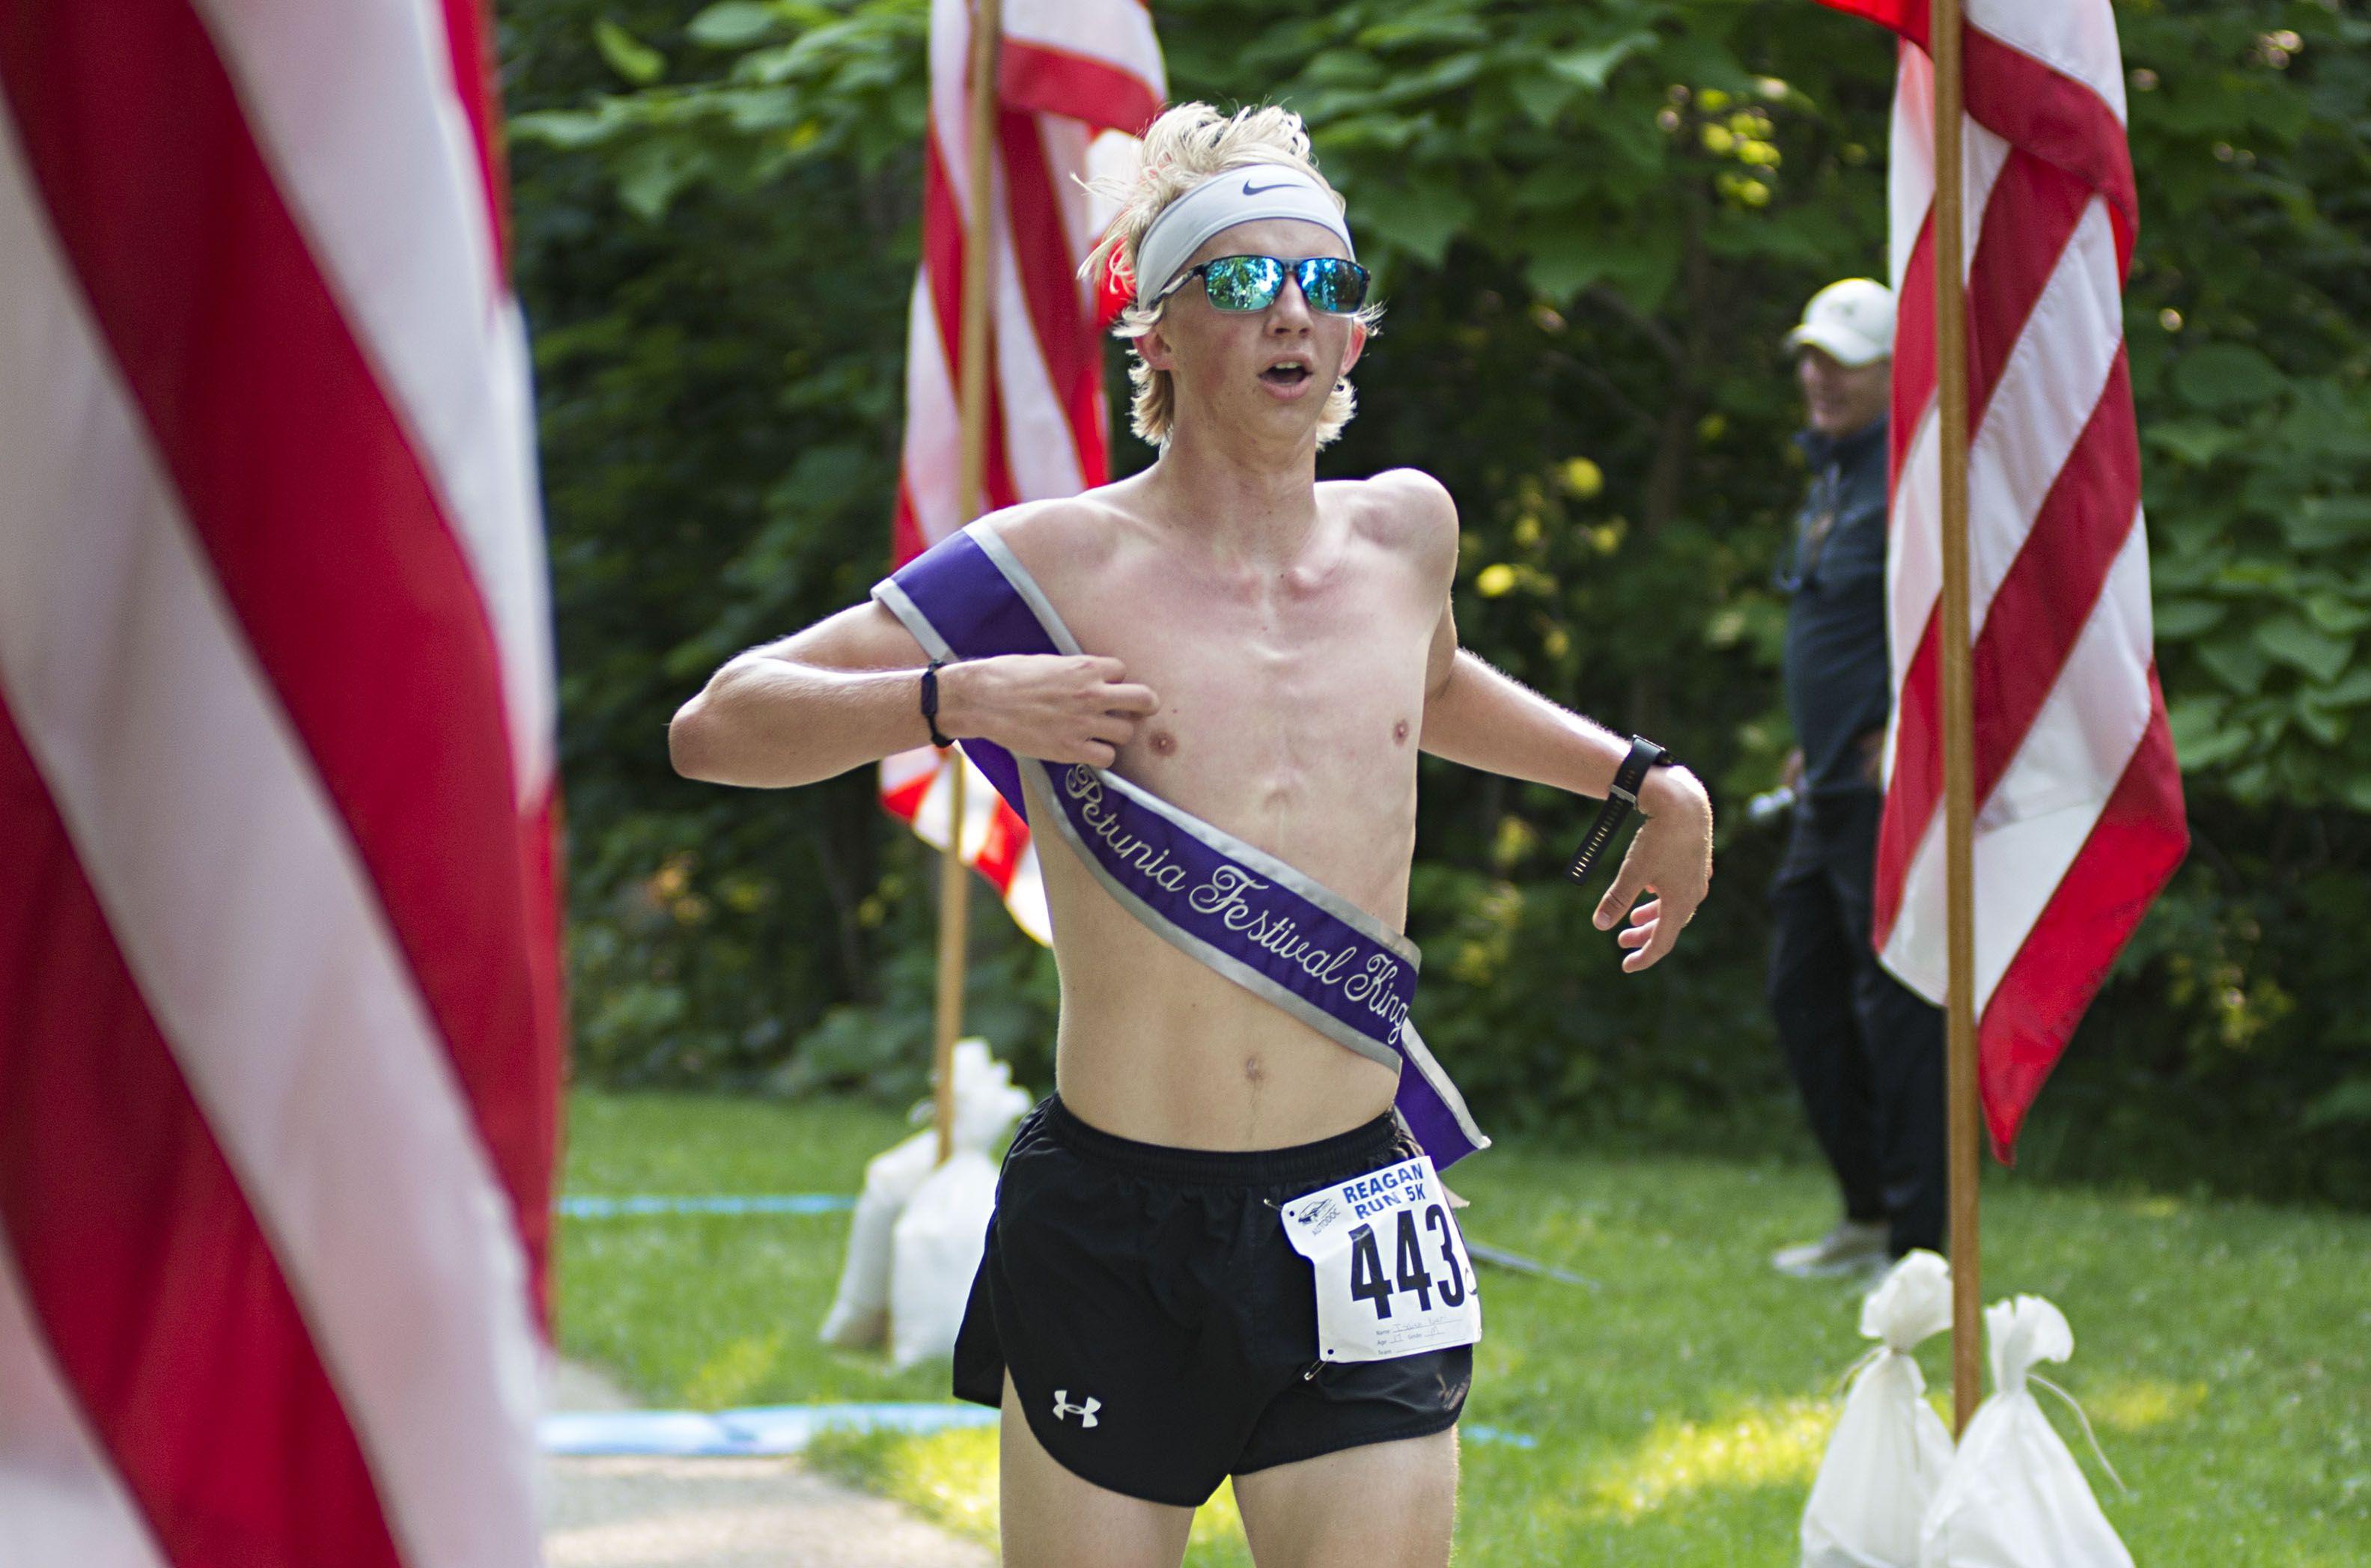 Isaiah Kuehl, the 2020 Petunia King, took 13th place during the Reagan Run.